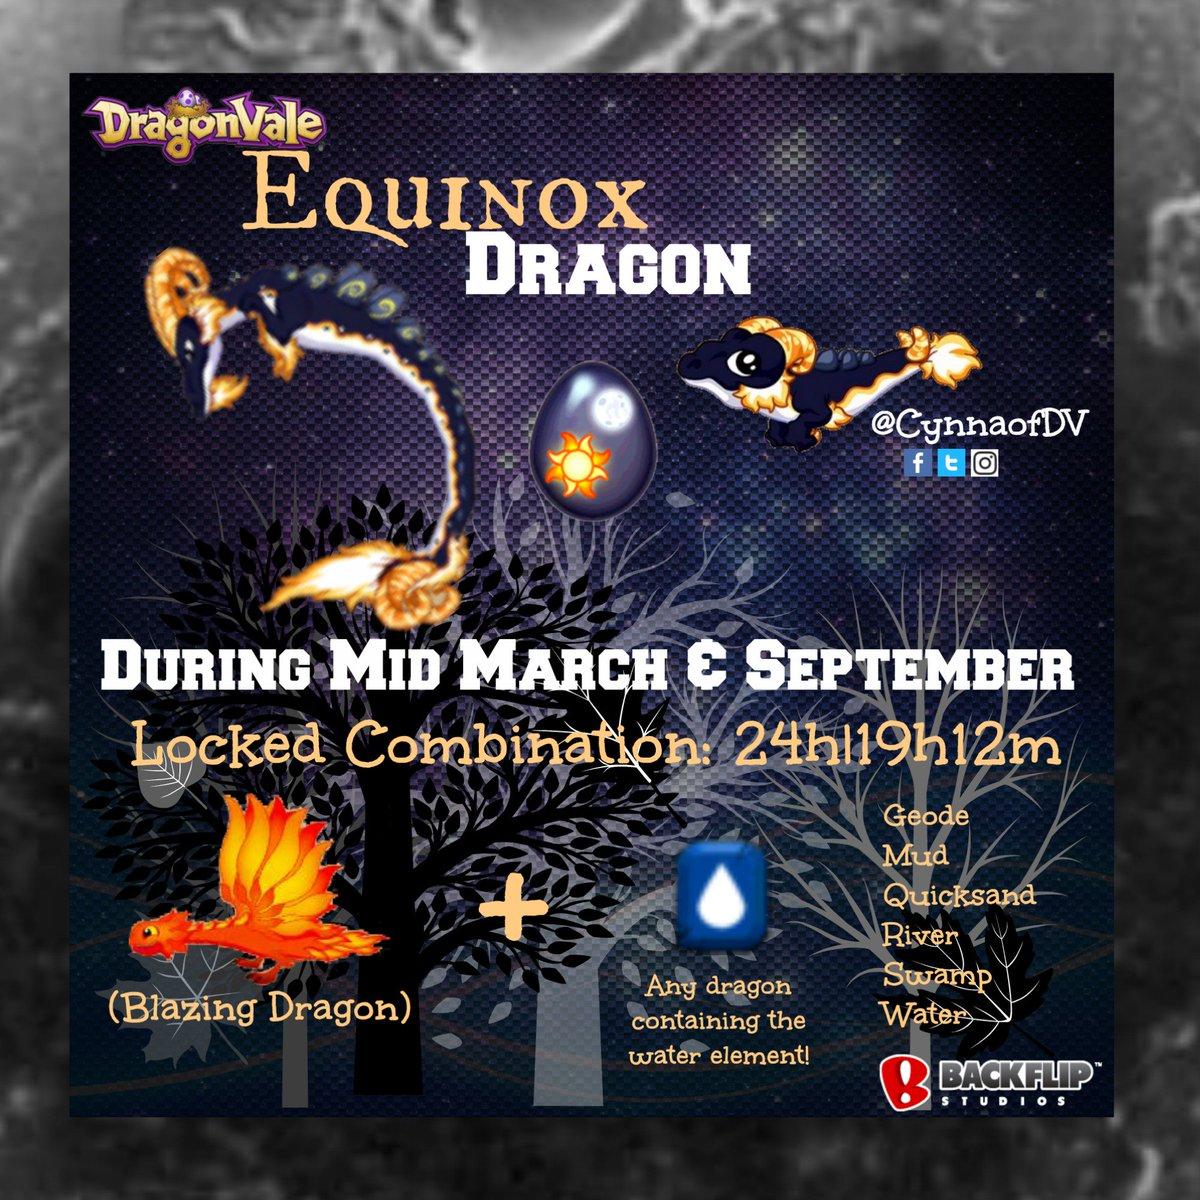 equinoxdragon hashtag on Twitter